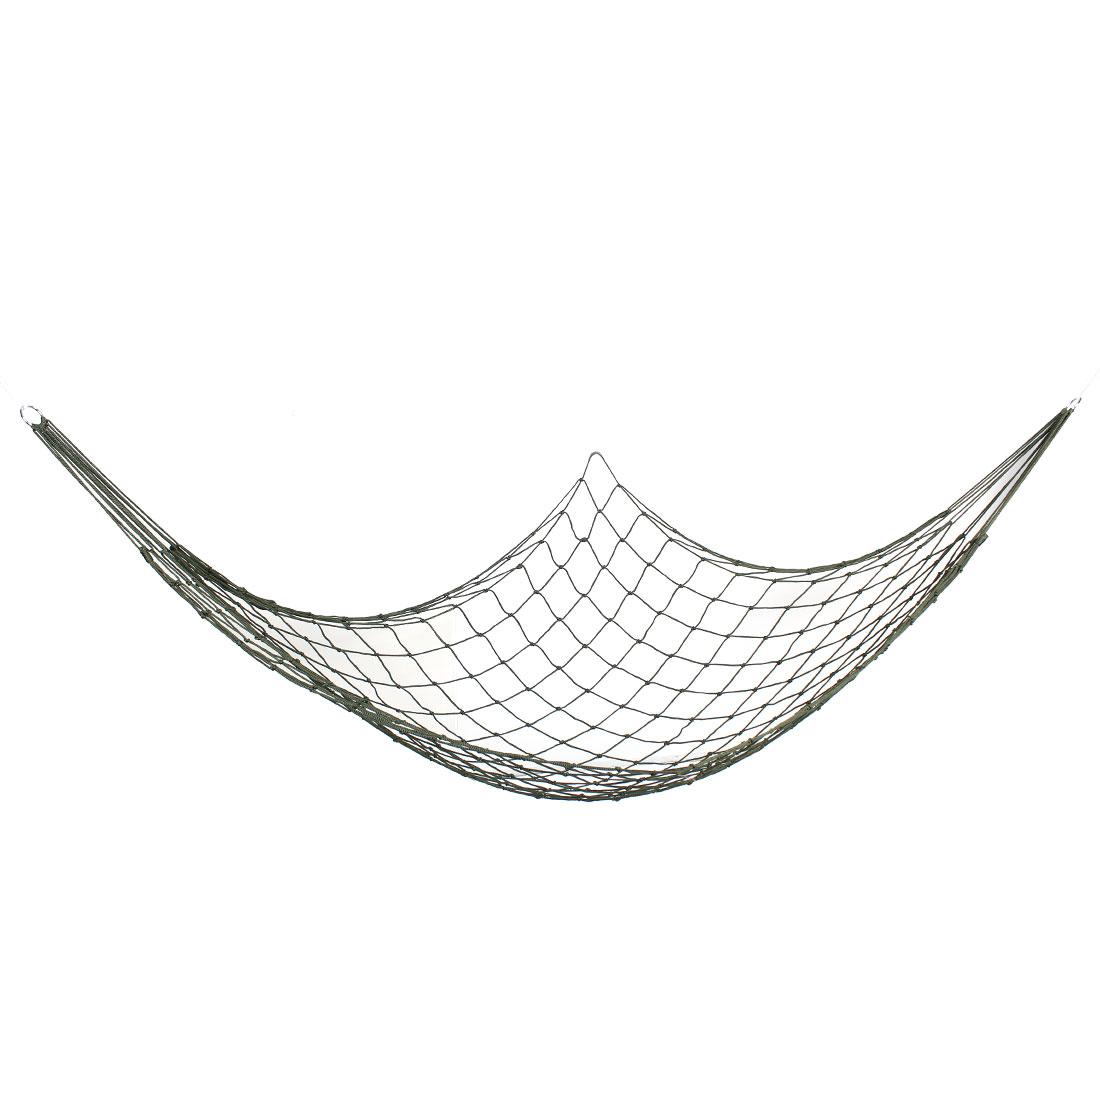 "Backyard Swing Mesh Sleeping Bed Hang Hammock Army Green 78.7"" Length"